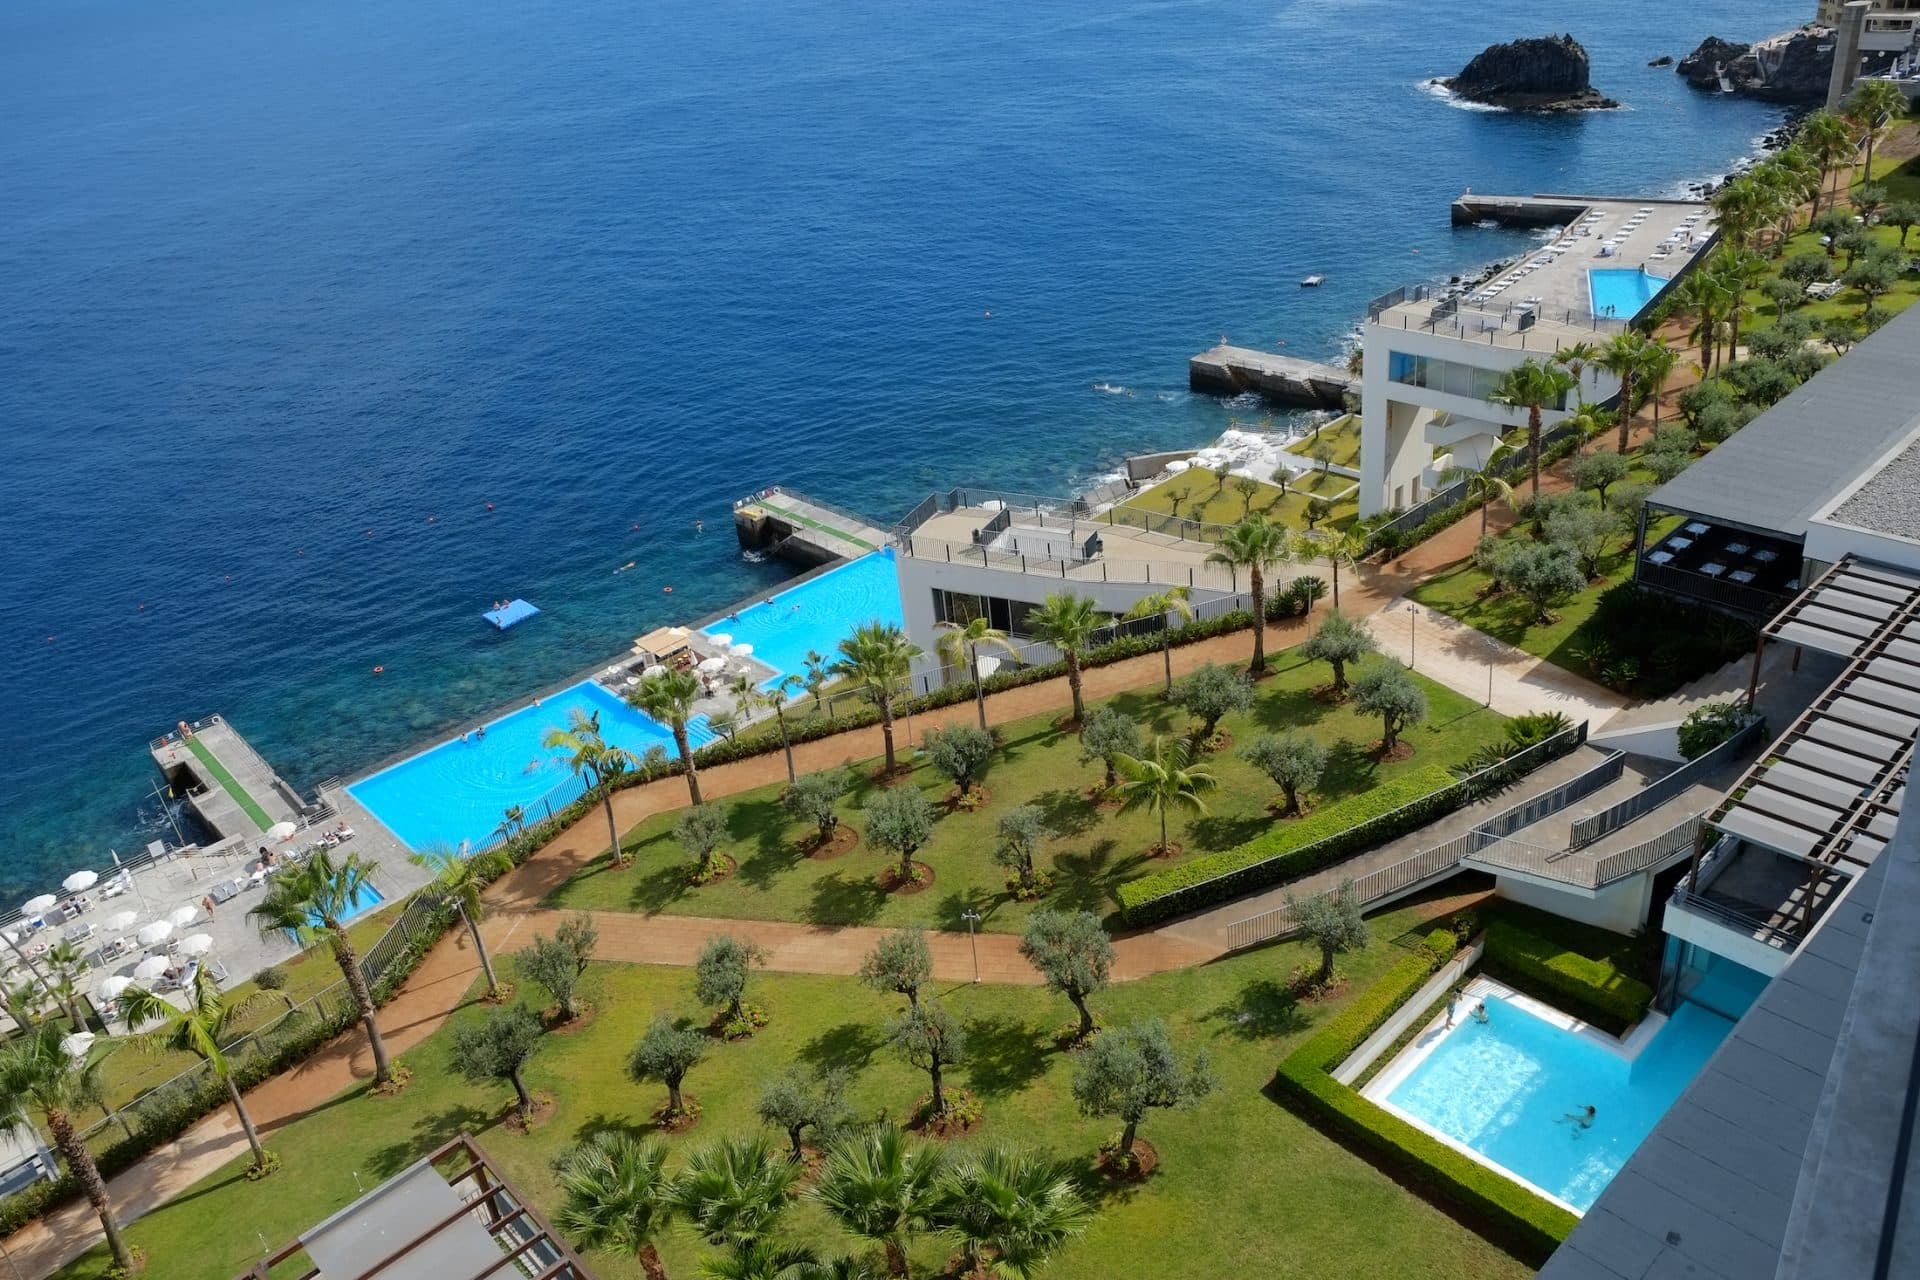 resort-overview-VidaMar-hotels-resorts-madeira